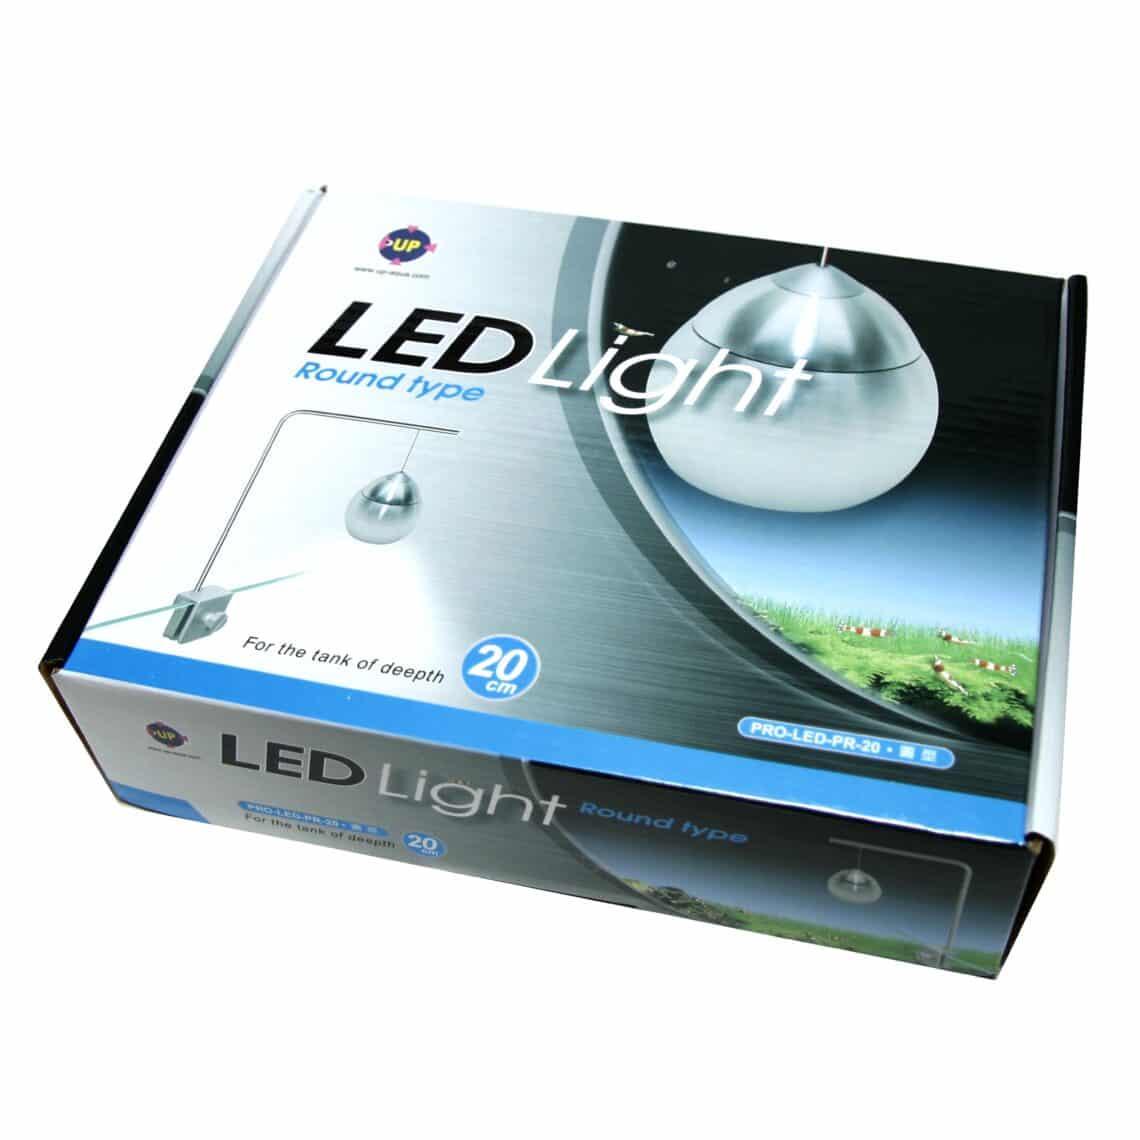 up-aqua-pro-led-pr-20-pendent-light-for-aquarium-2